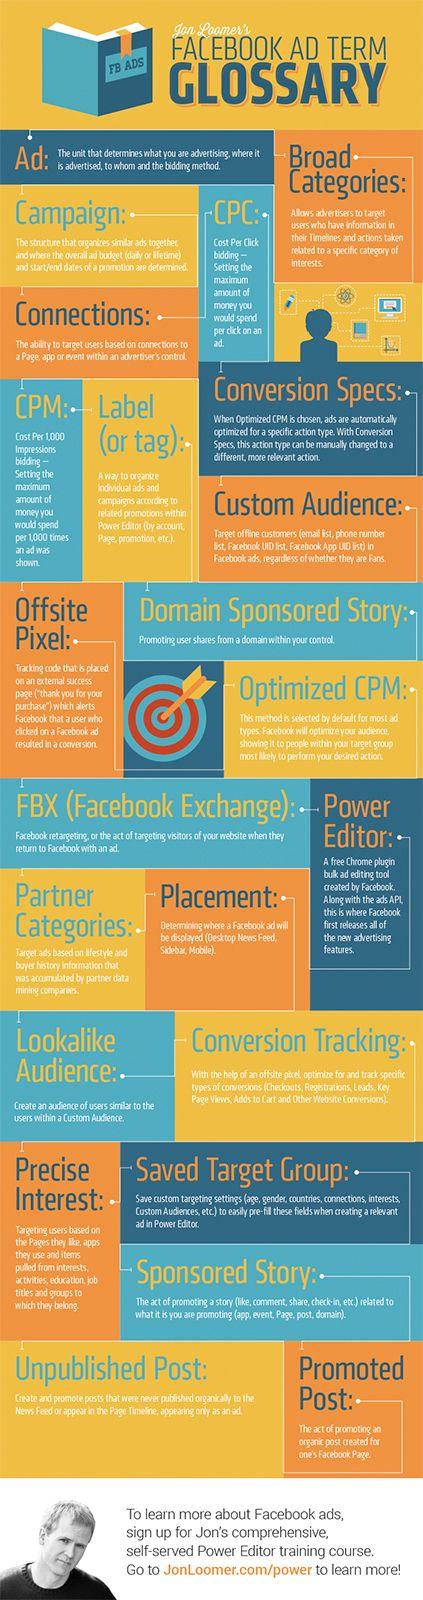 33 best Social Media - Facebook images on Pinterest - nist 800 53 controls spreadsheet